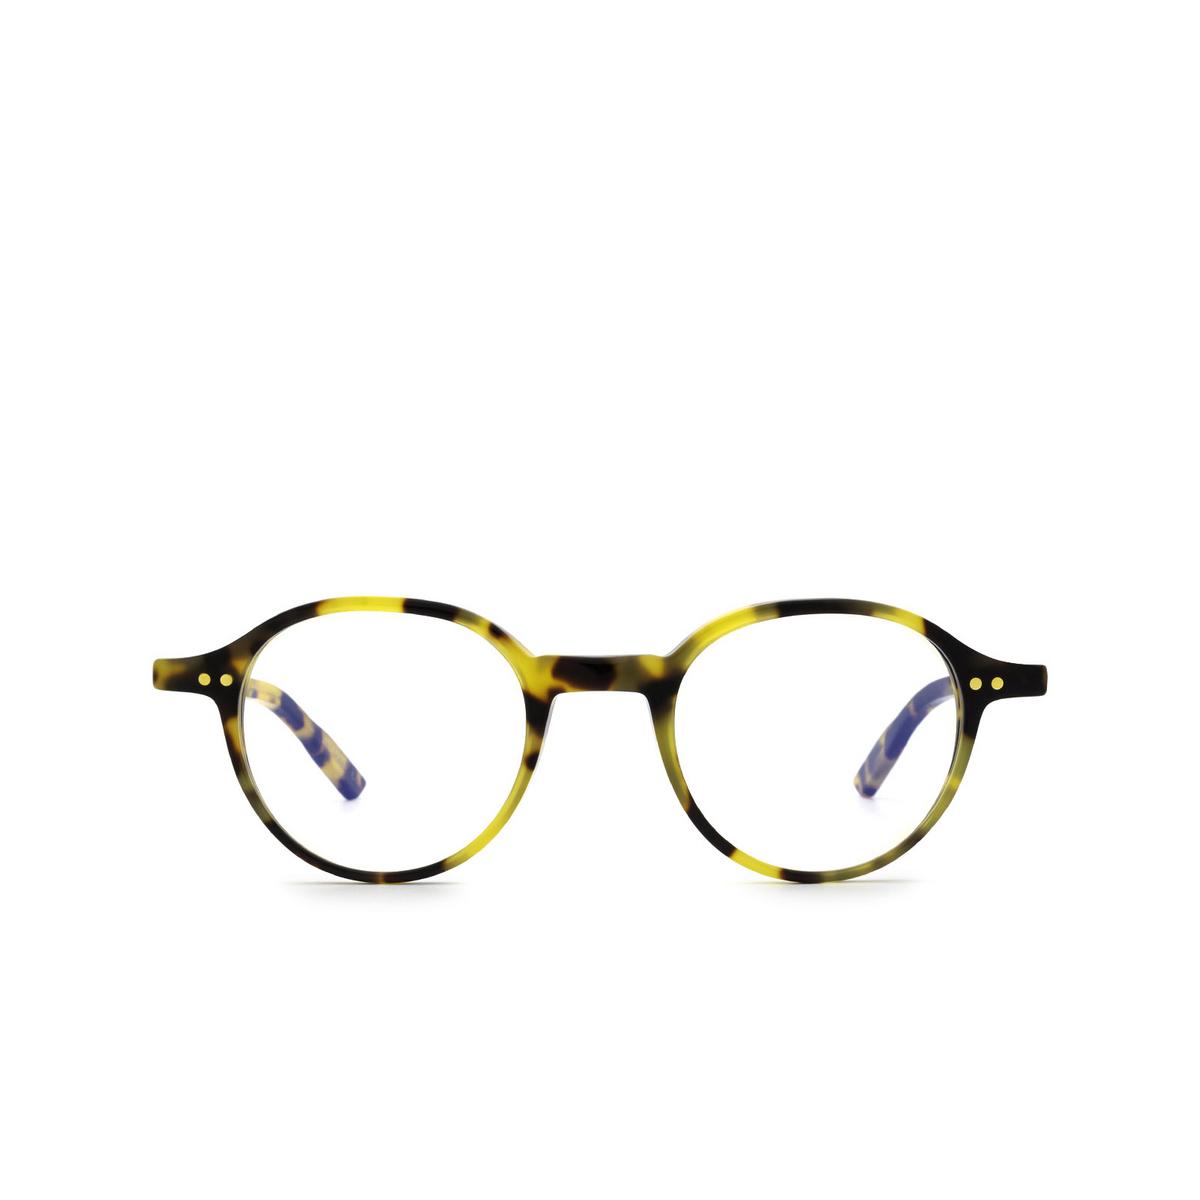 Lesca® Round Eyeglasses: Puno color Havana 4 - front view.